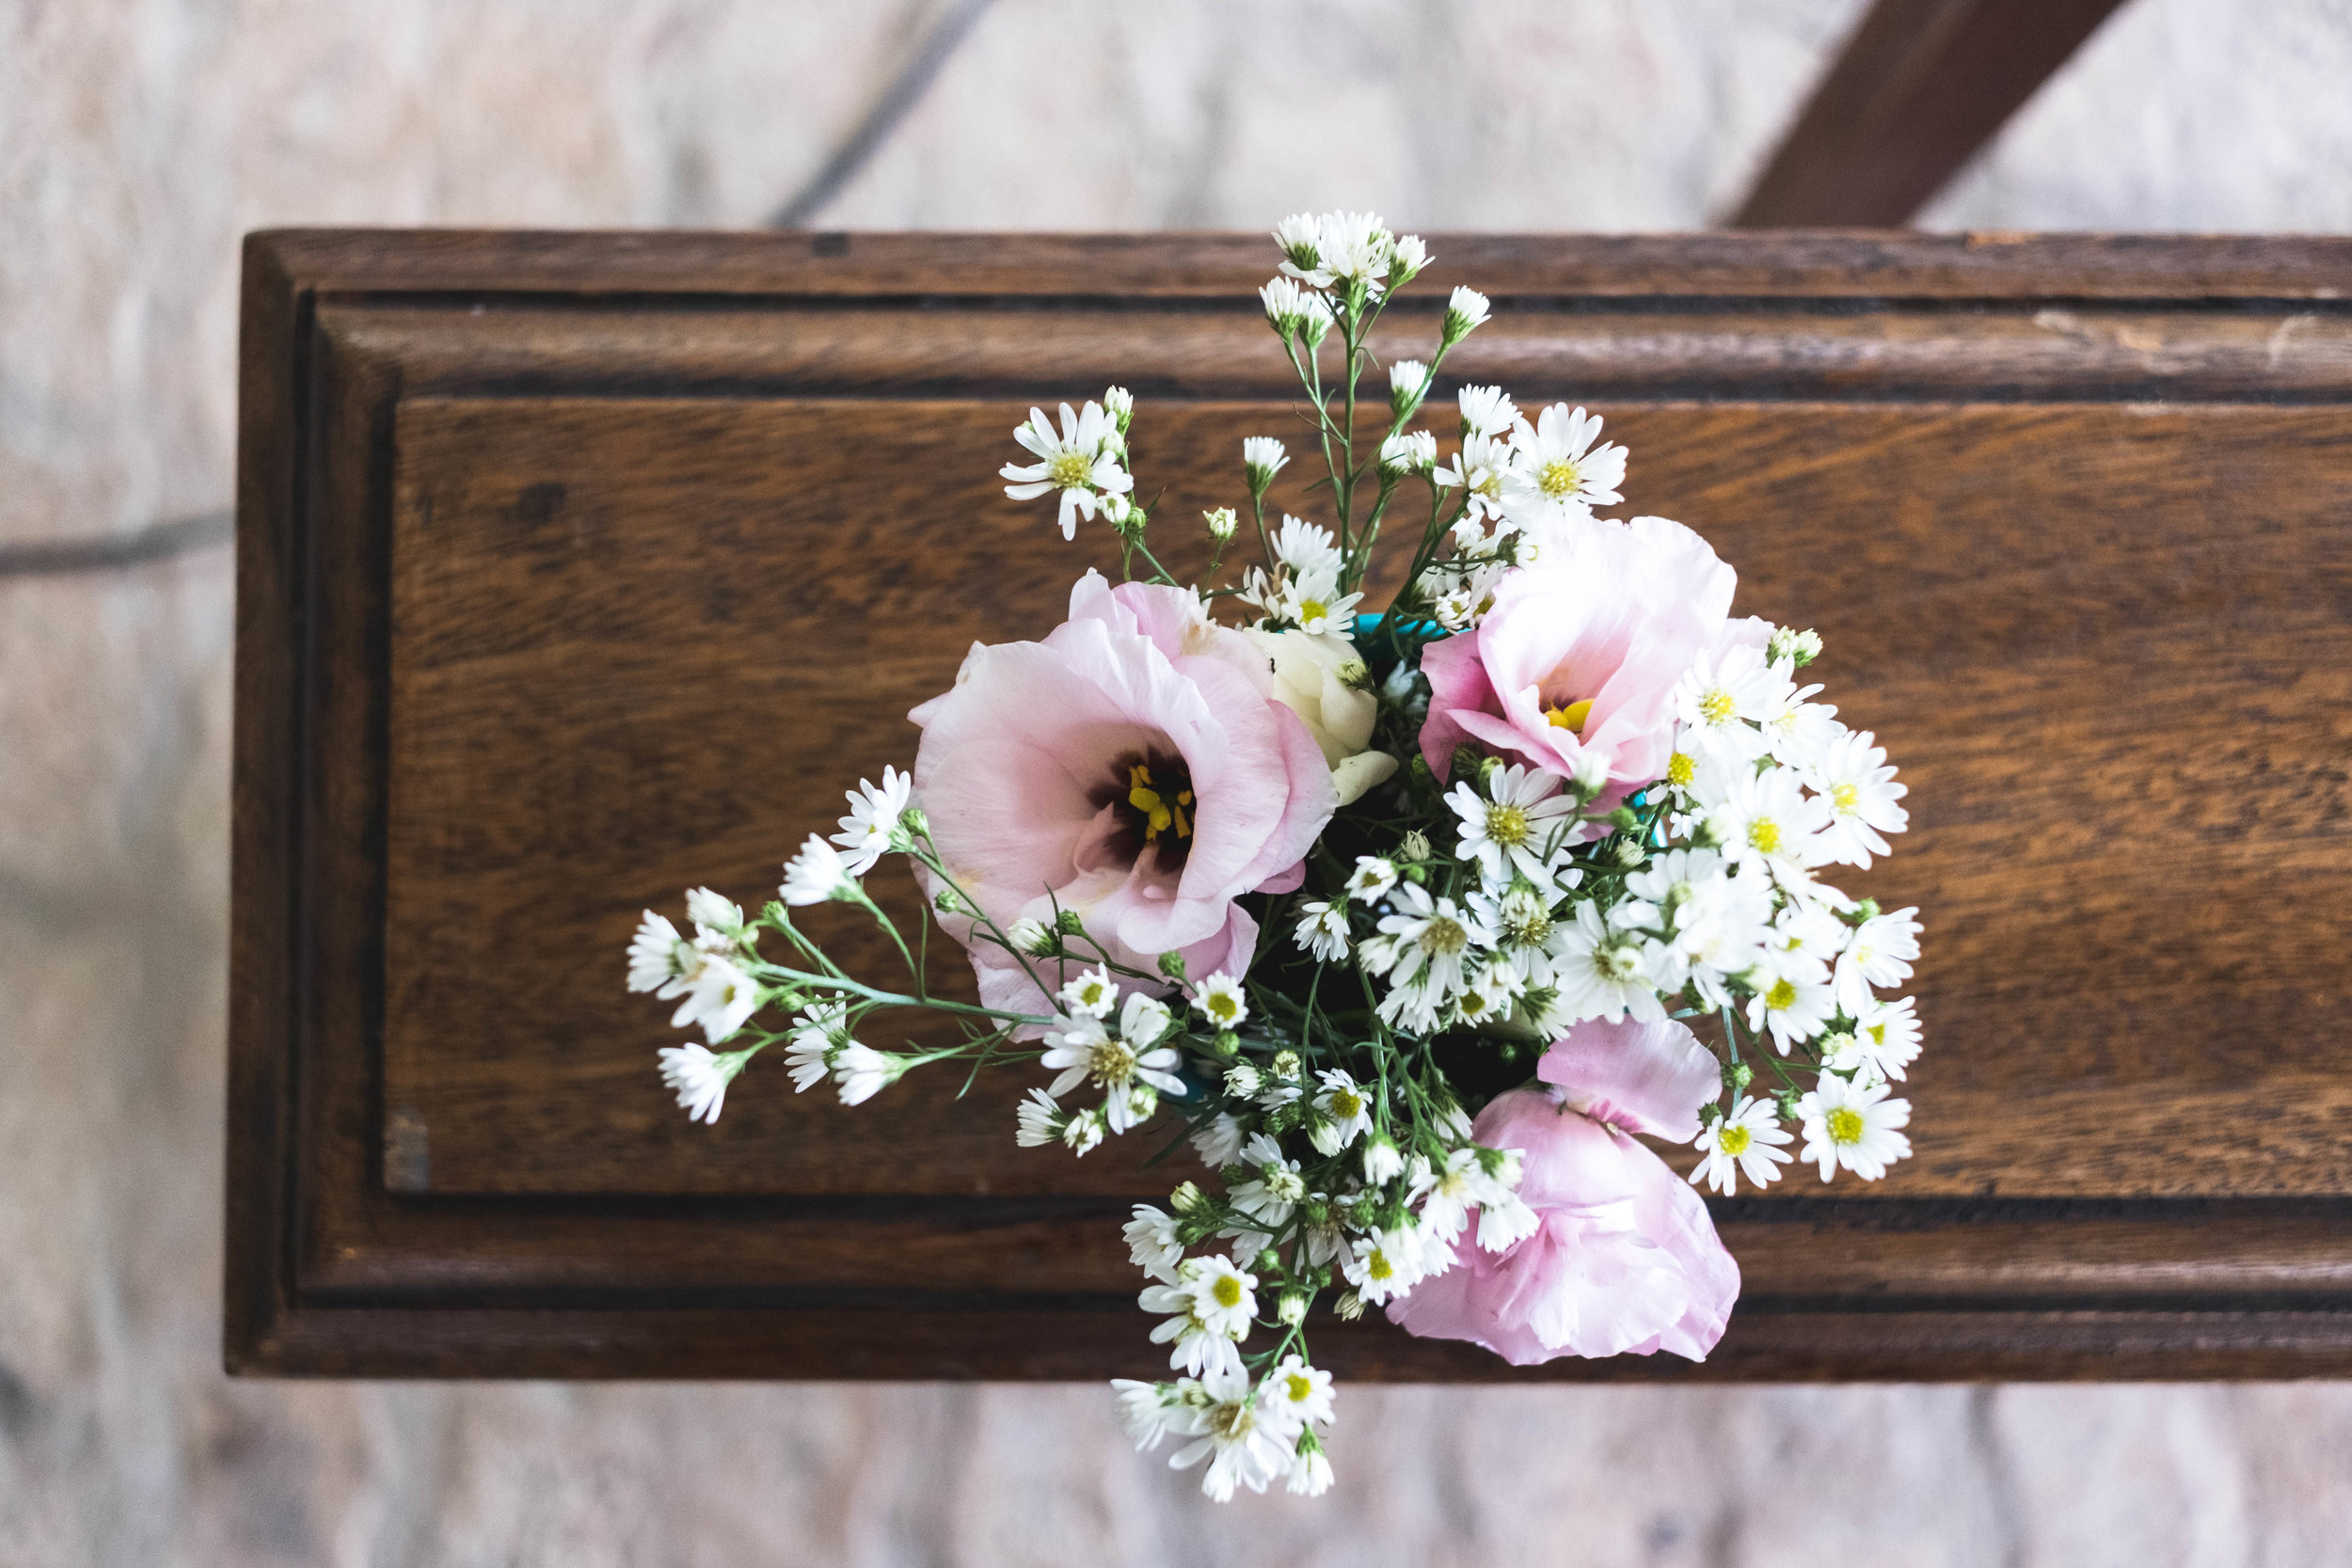 Funeral & Sympathy -